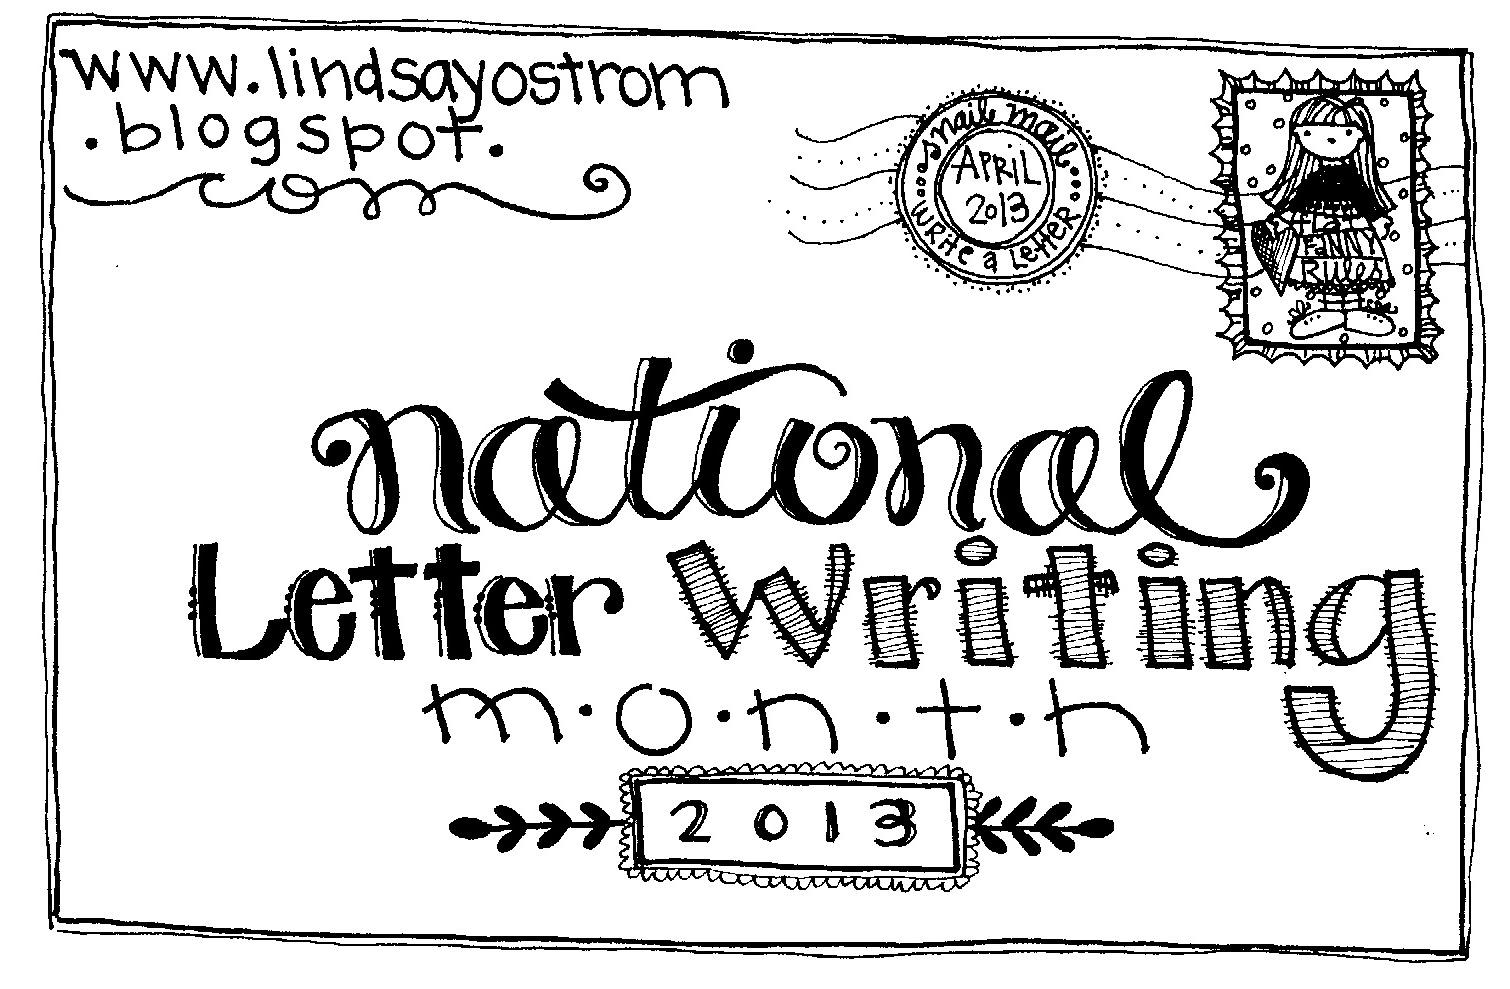 Lindsay Ostrom Postcards For Peoples